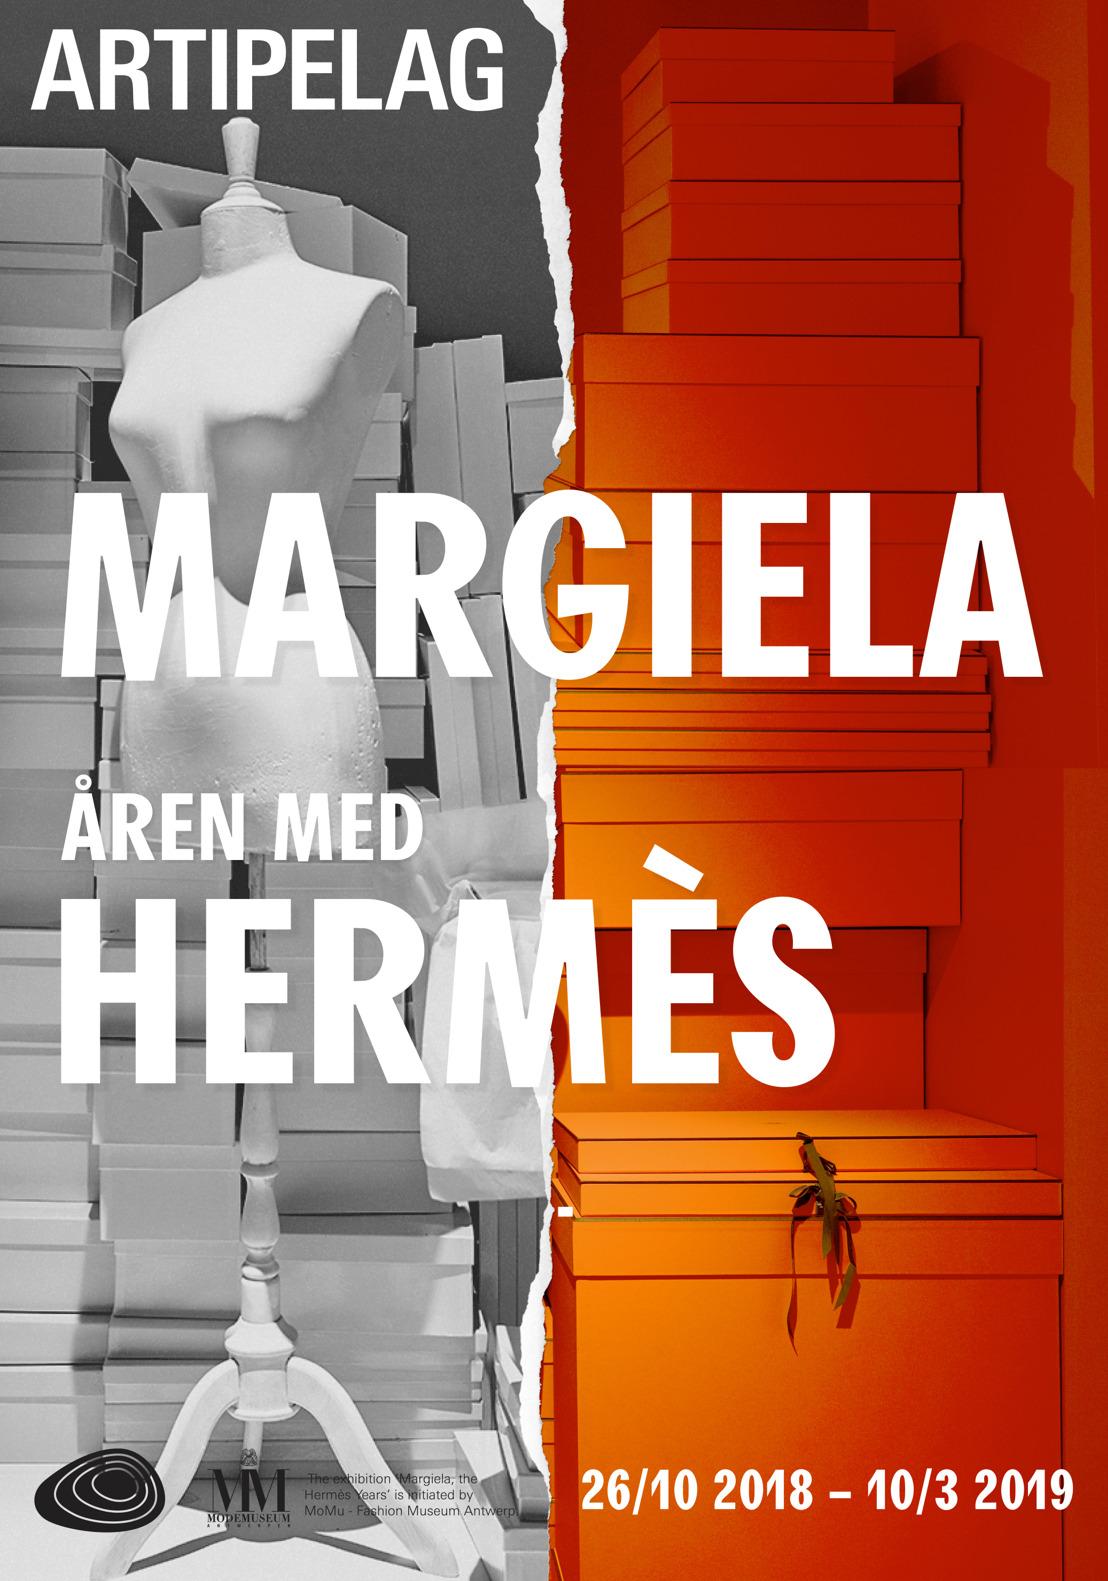 'Margiela, the Hermès years' travels to Sweden